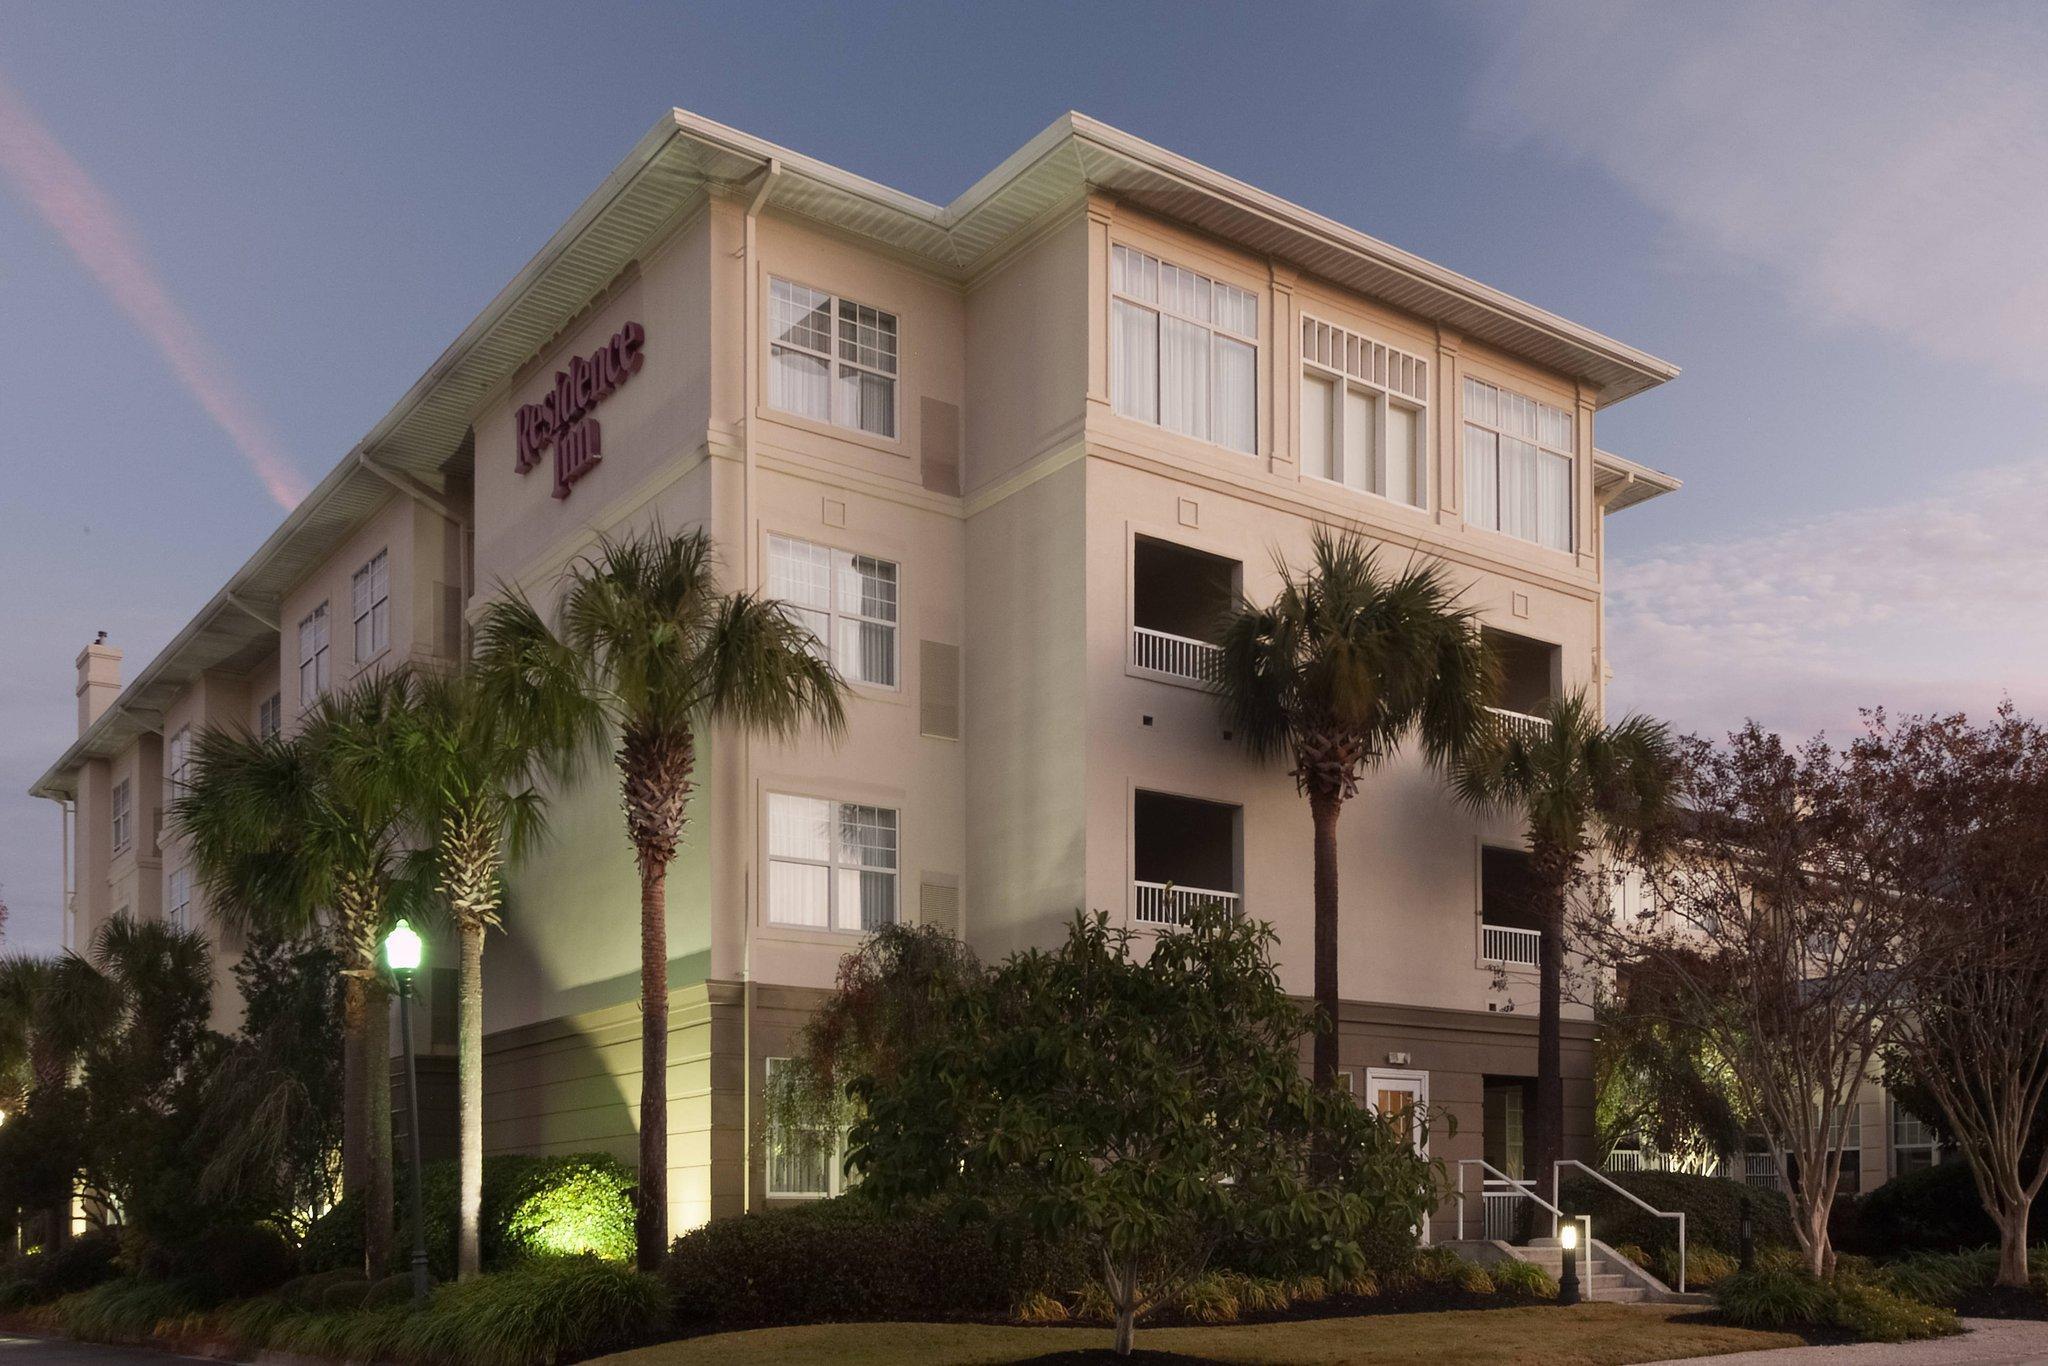 Residence Inn Charleston Downtown Riverview